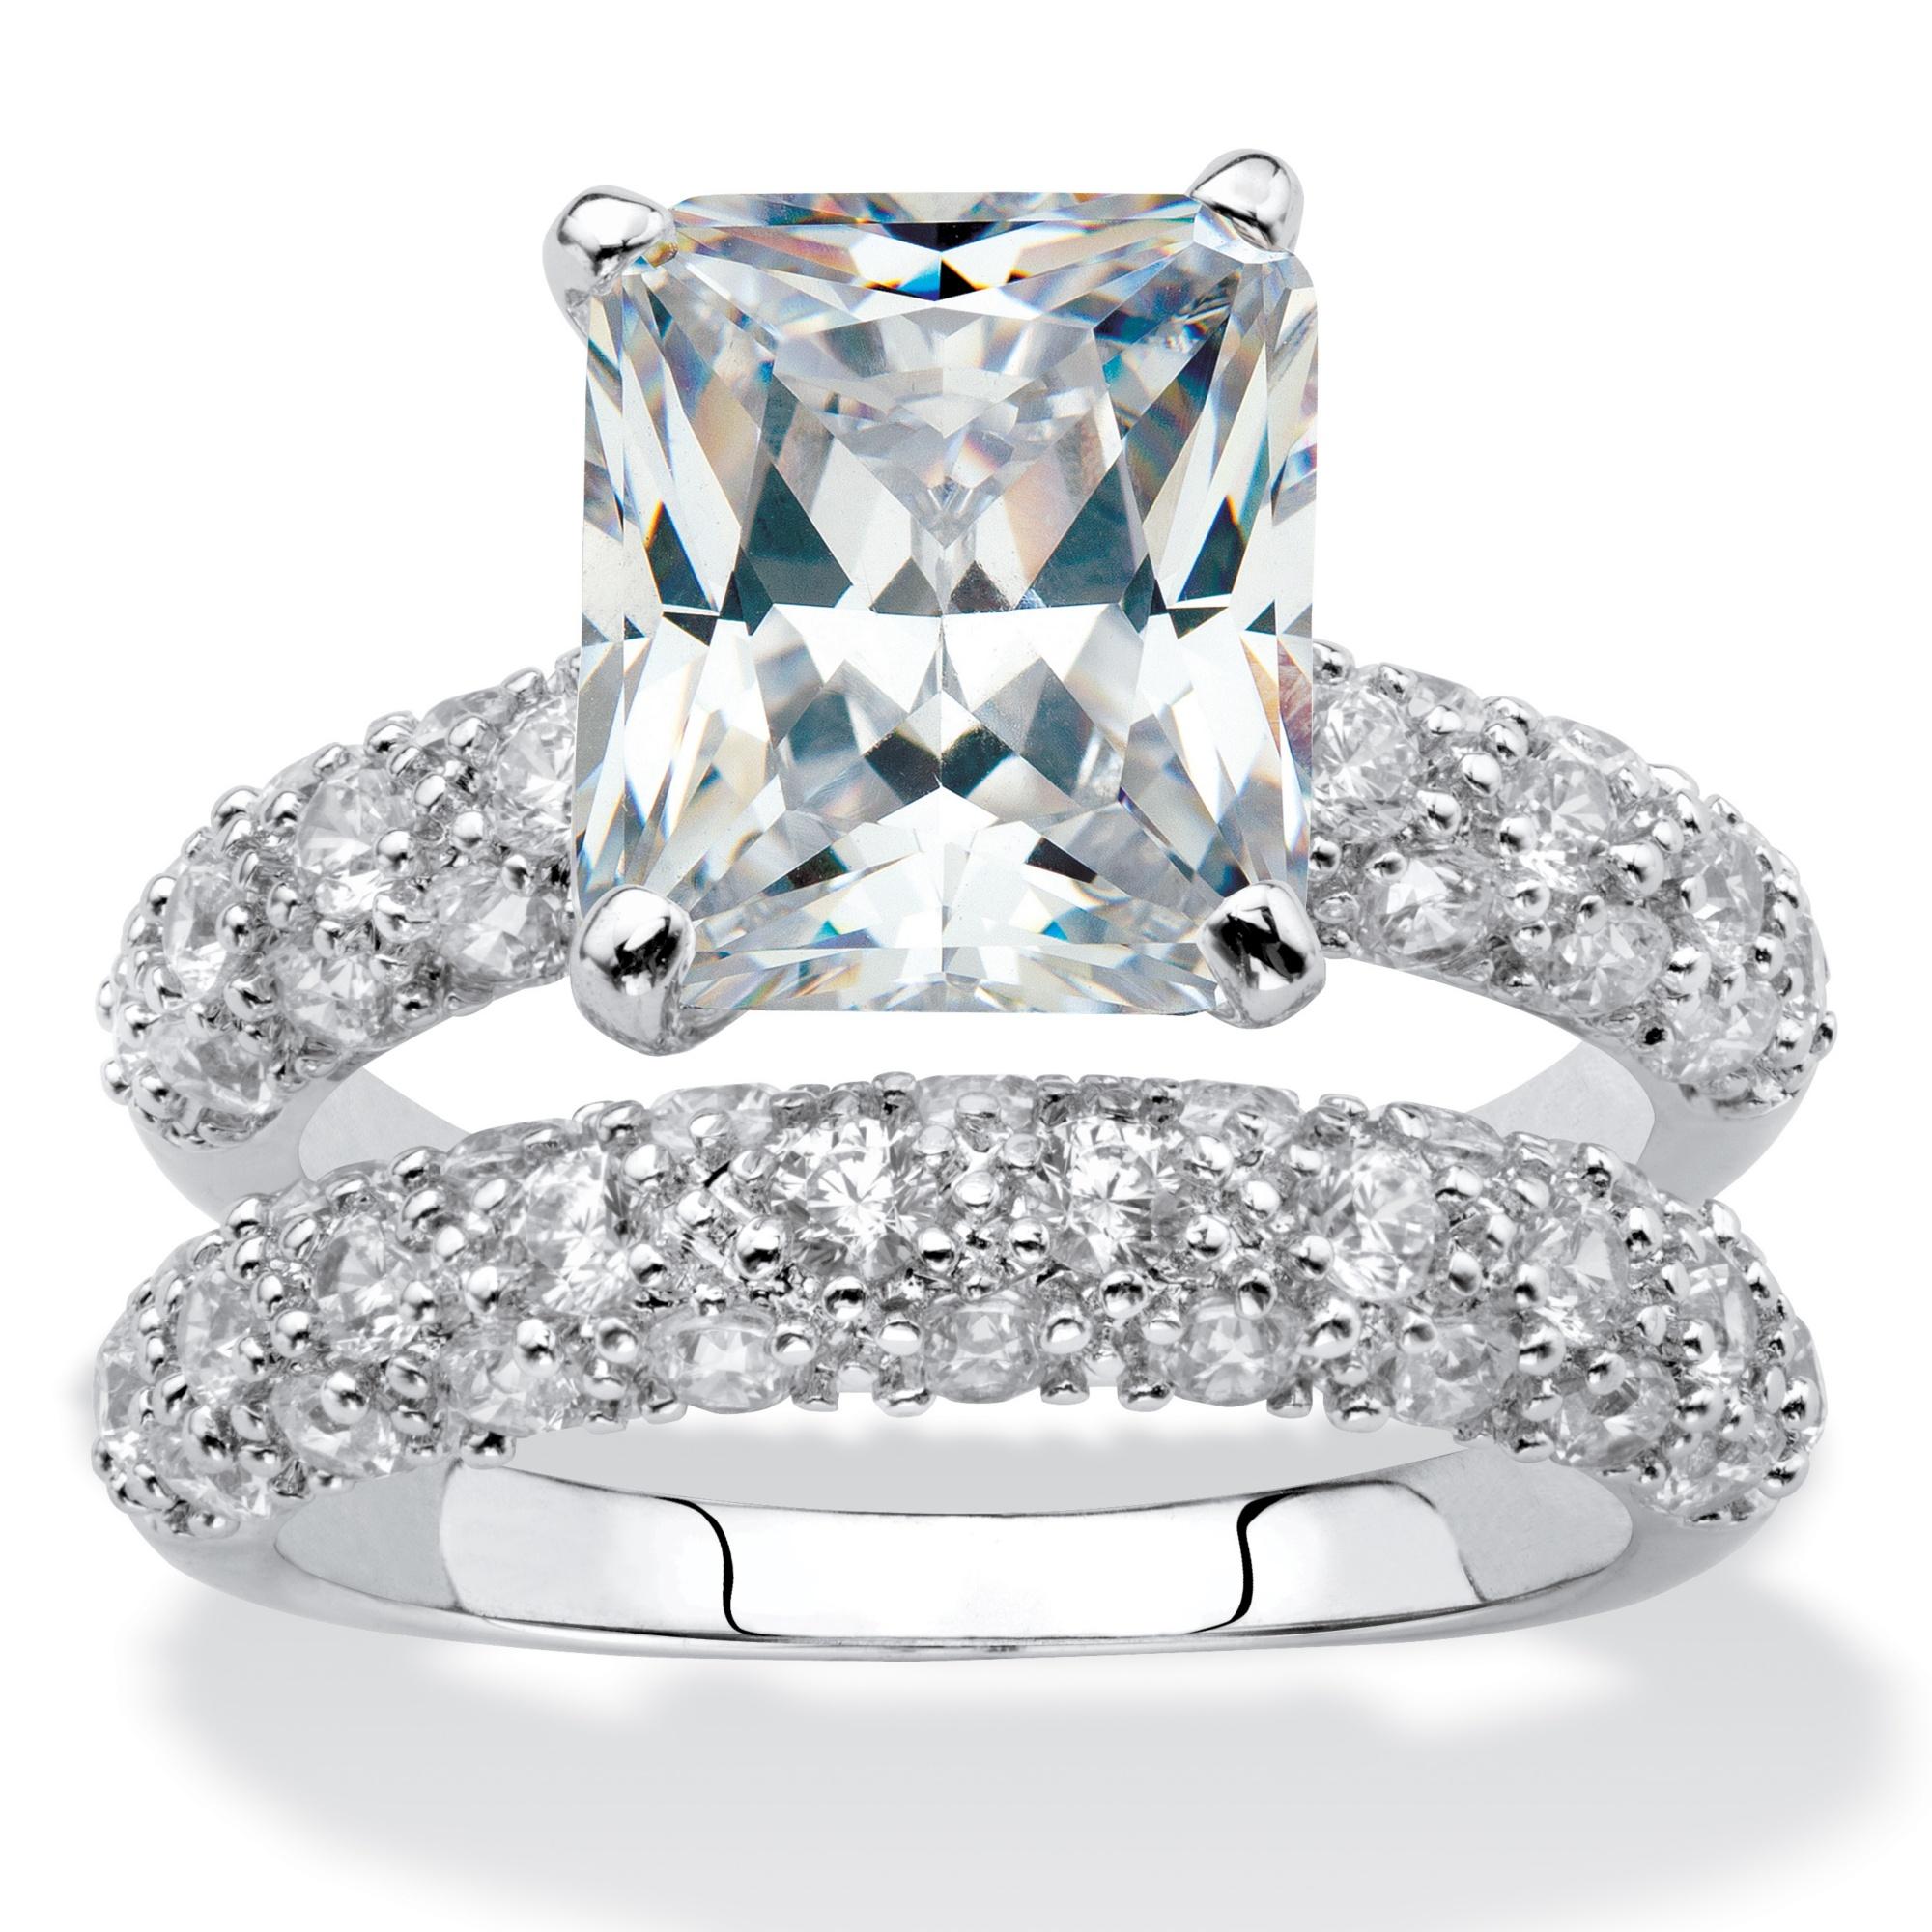 6 50 Tcw Emerald Cut Cubic Zirconia Platinum Plated Bridal